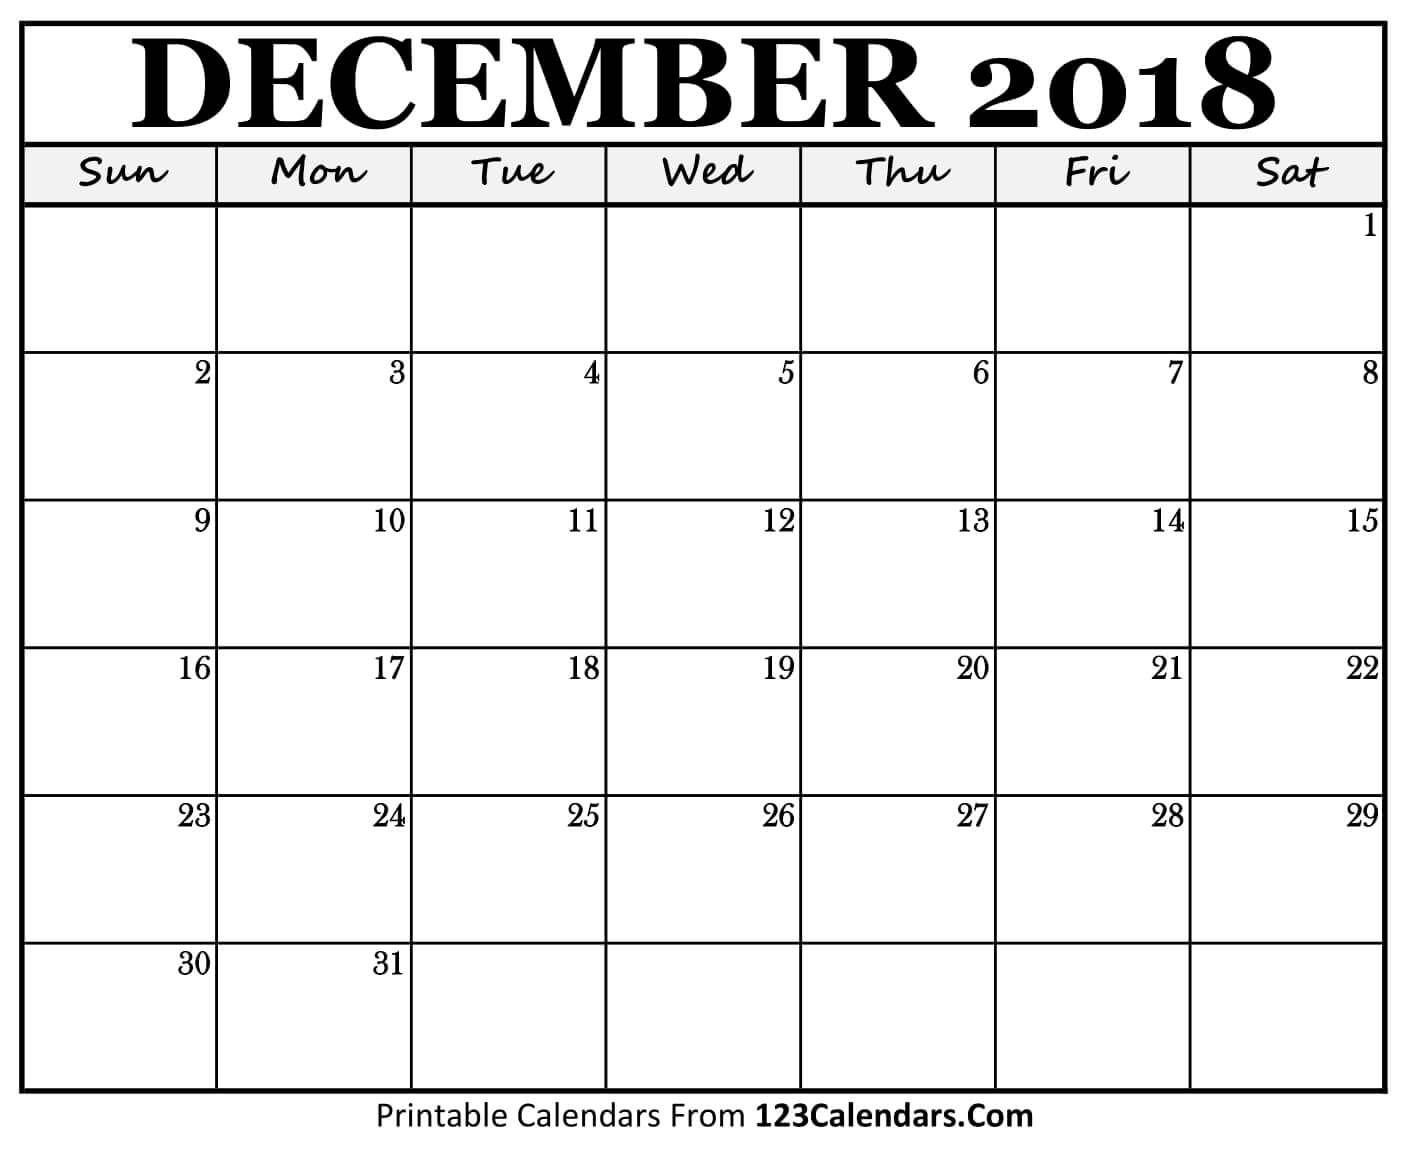 Printable December 2018 Calendar Templates - 123Calendars